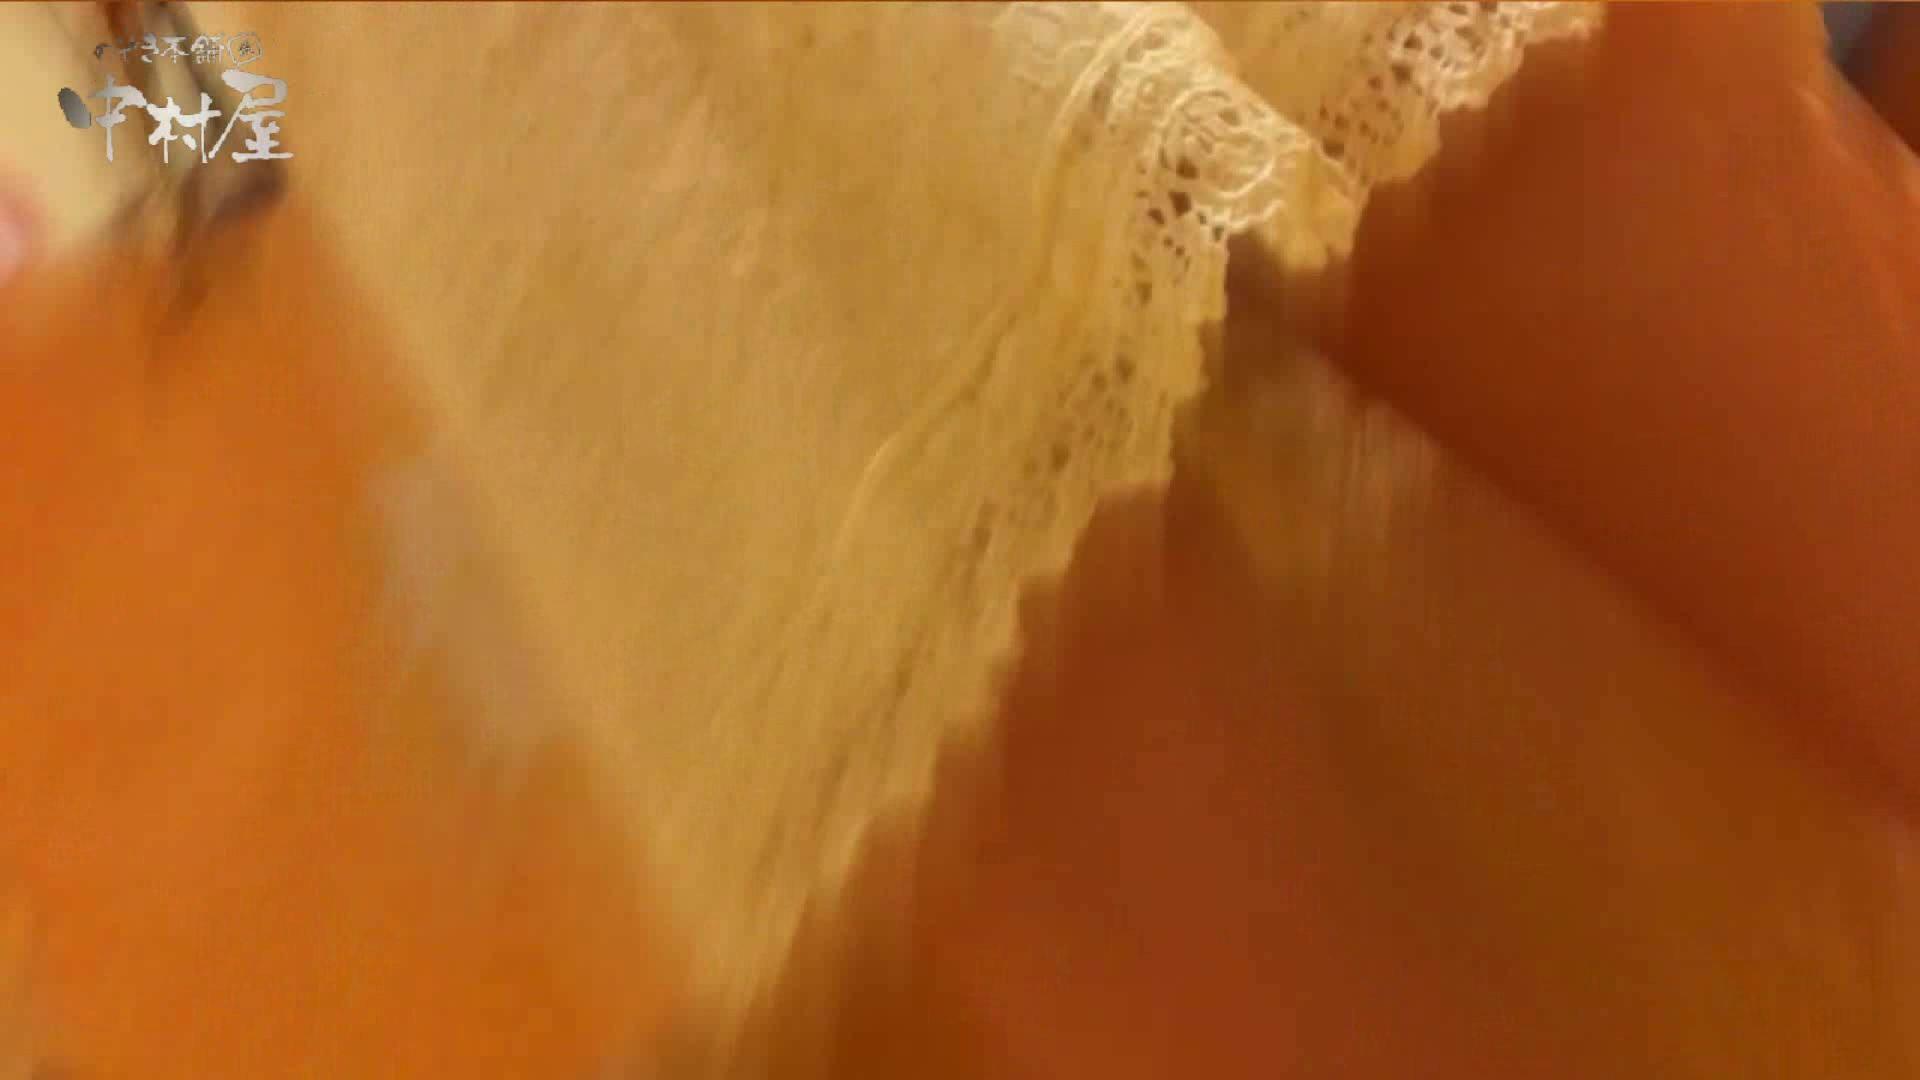 vol.81 美人アパレル胸チラ&パンチラ 食い込みショッピング チラ | 胸チラ  54pic 21